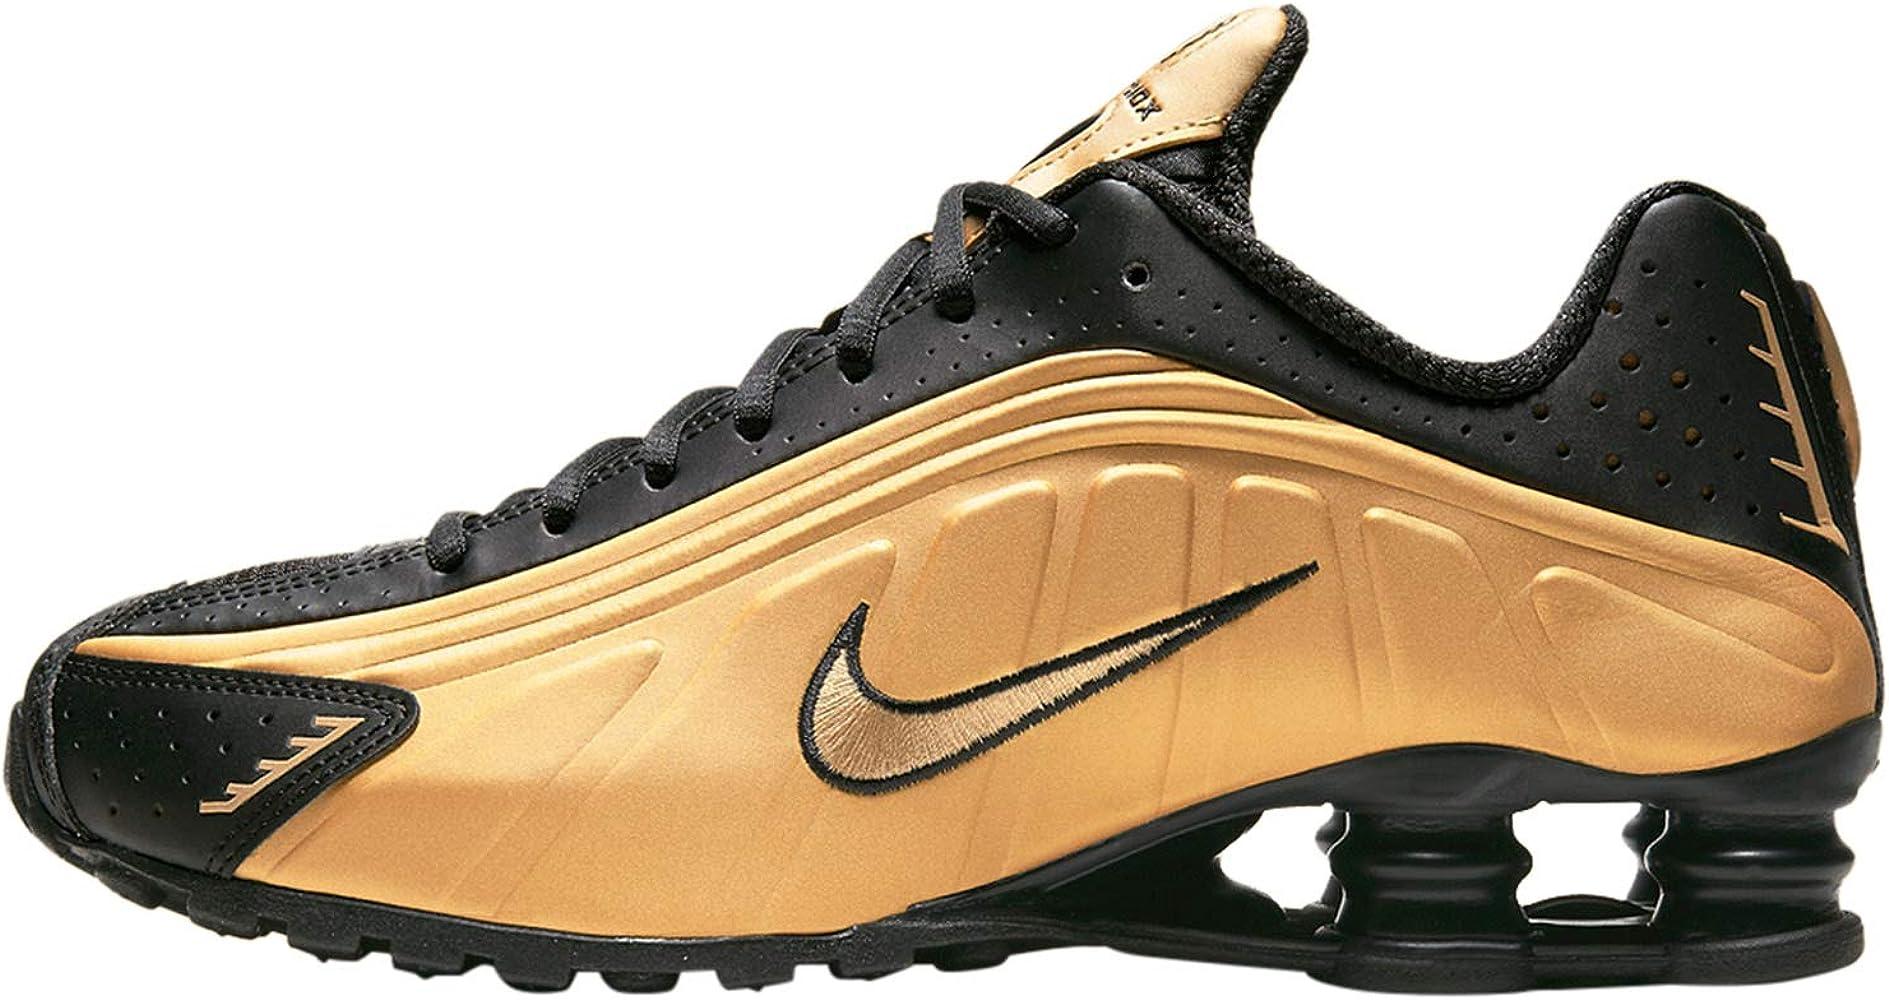 Nike Shox R4 Metallic Gold/Black